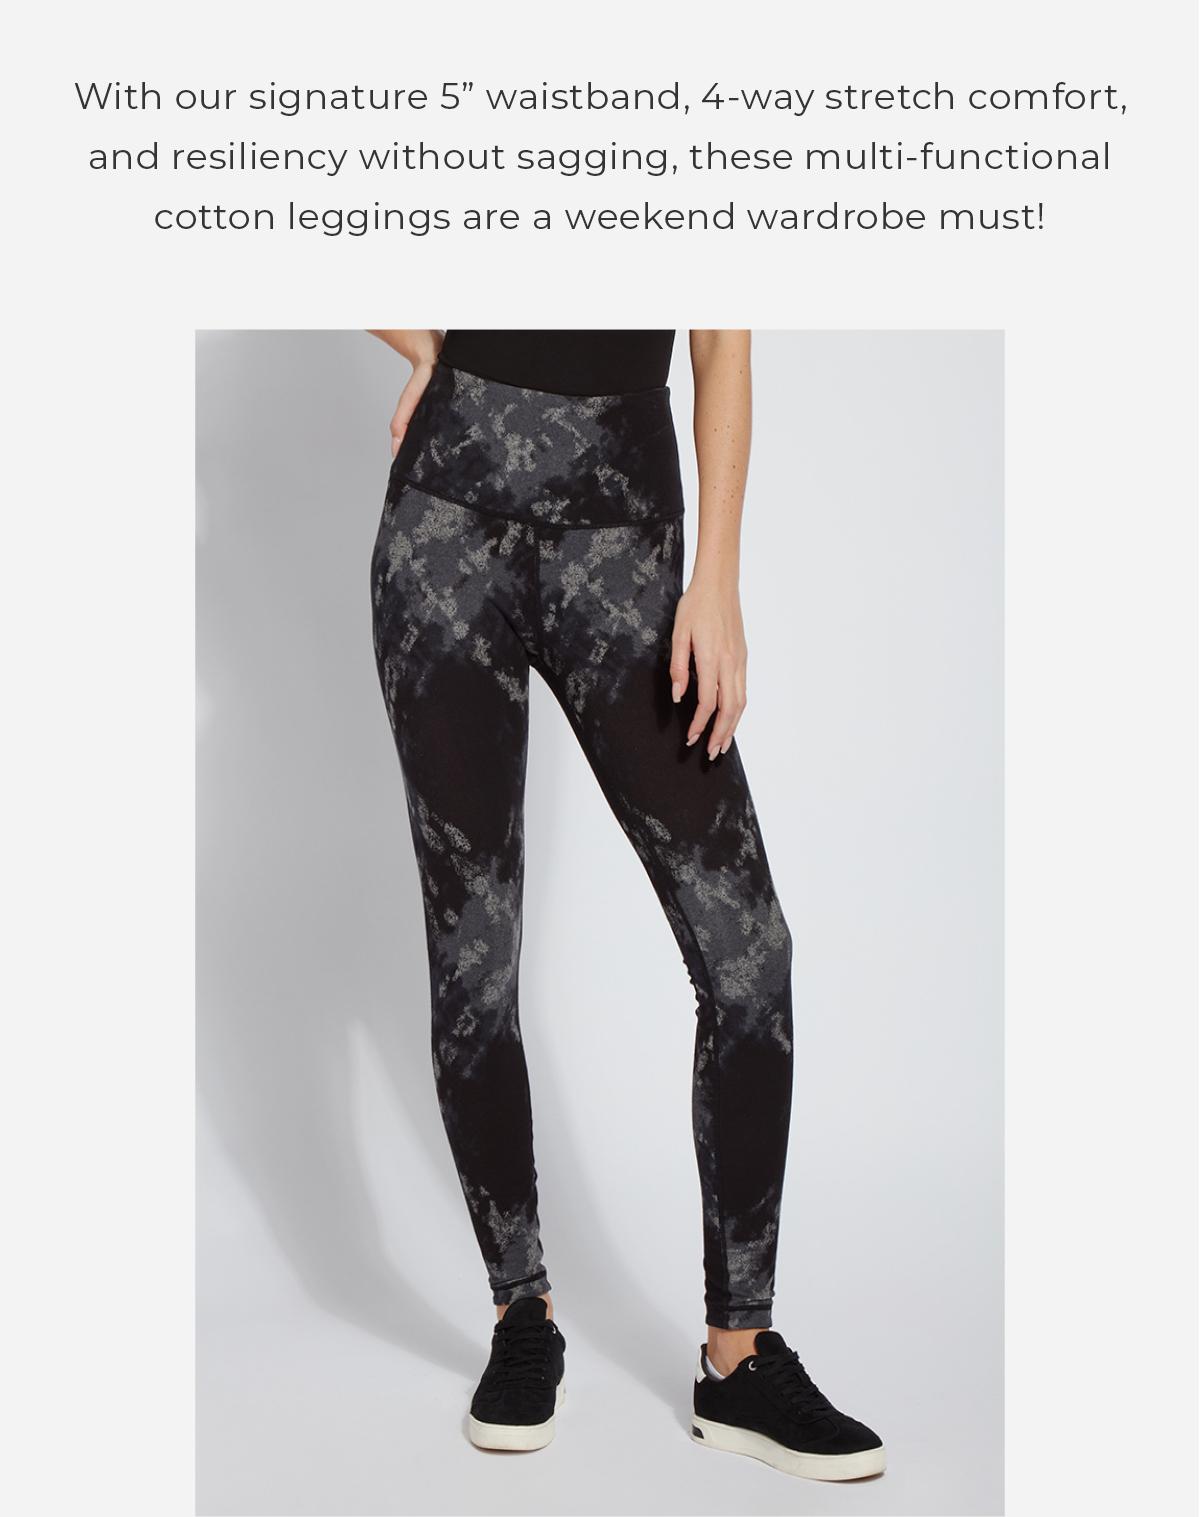 The Reversible Cotton Legging